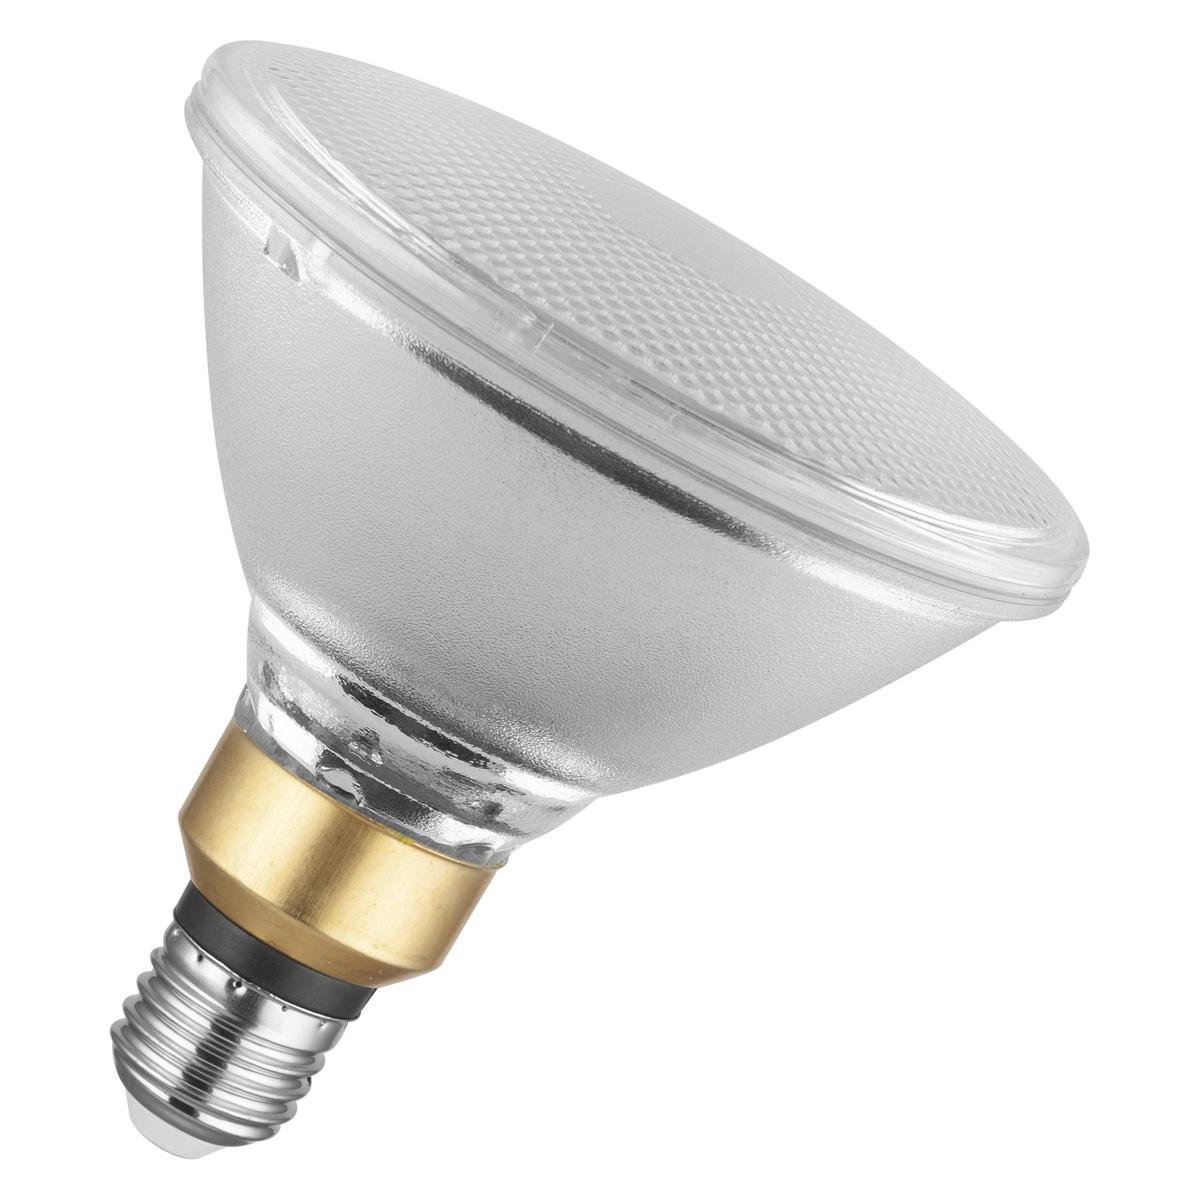 OSRAM PARATHOM PAR38 LED SPOT 15° IP65 E27 12,5W=120W 1035lm warm white 2700K A+